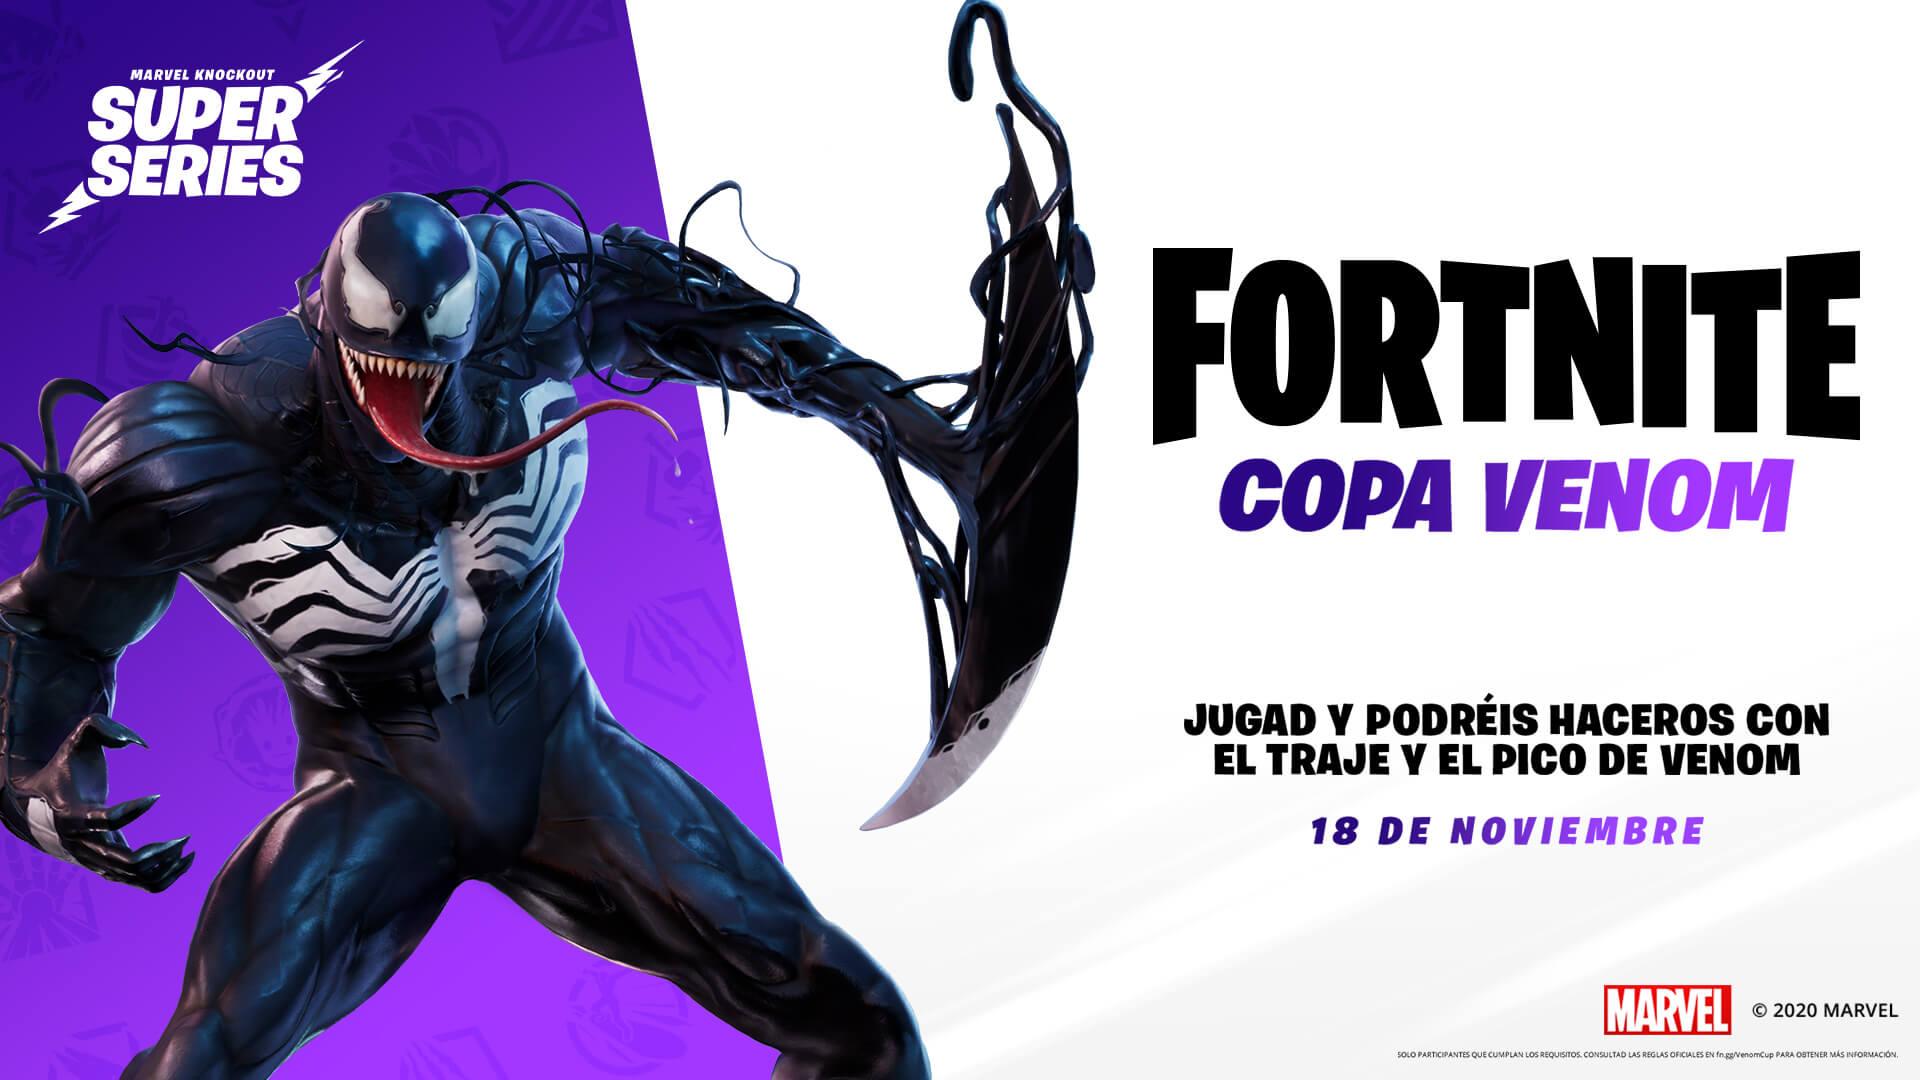 Fortnite Venom Outfit Es Es